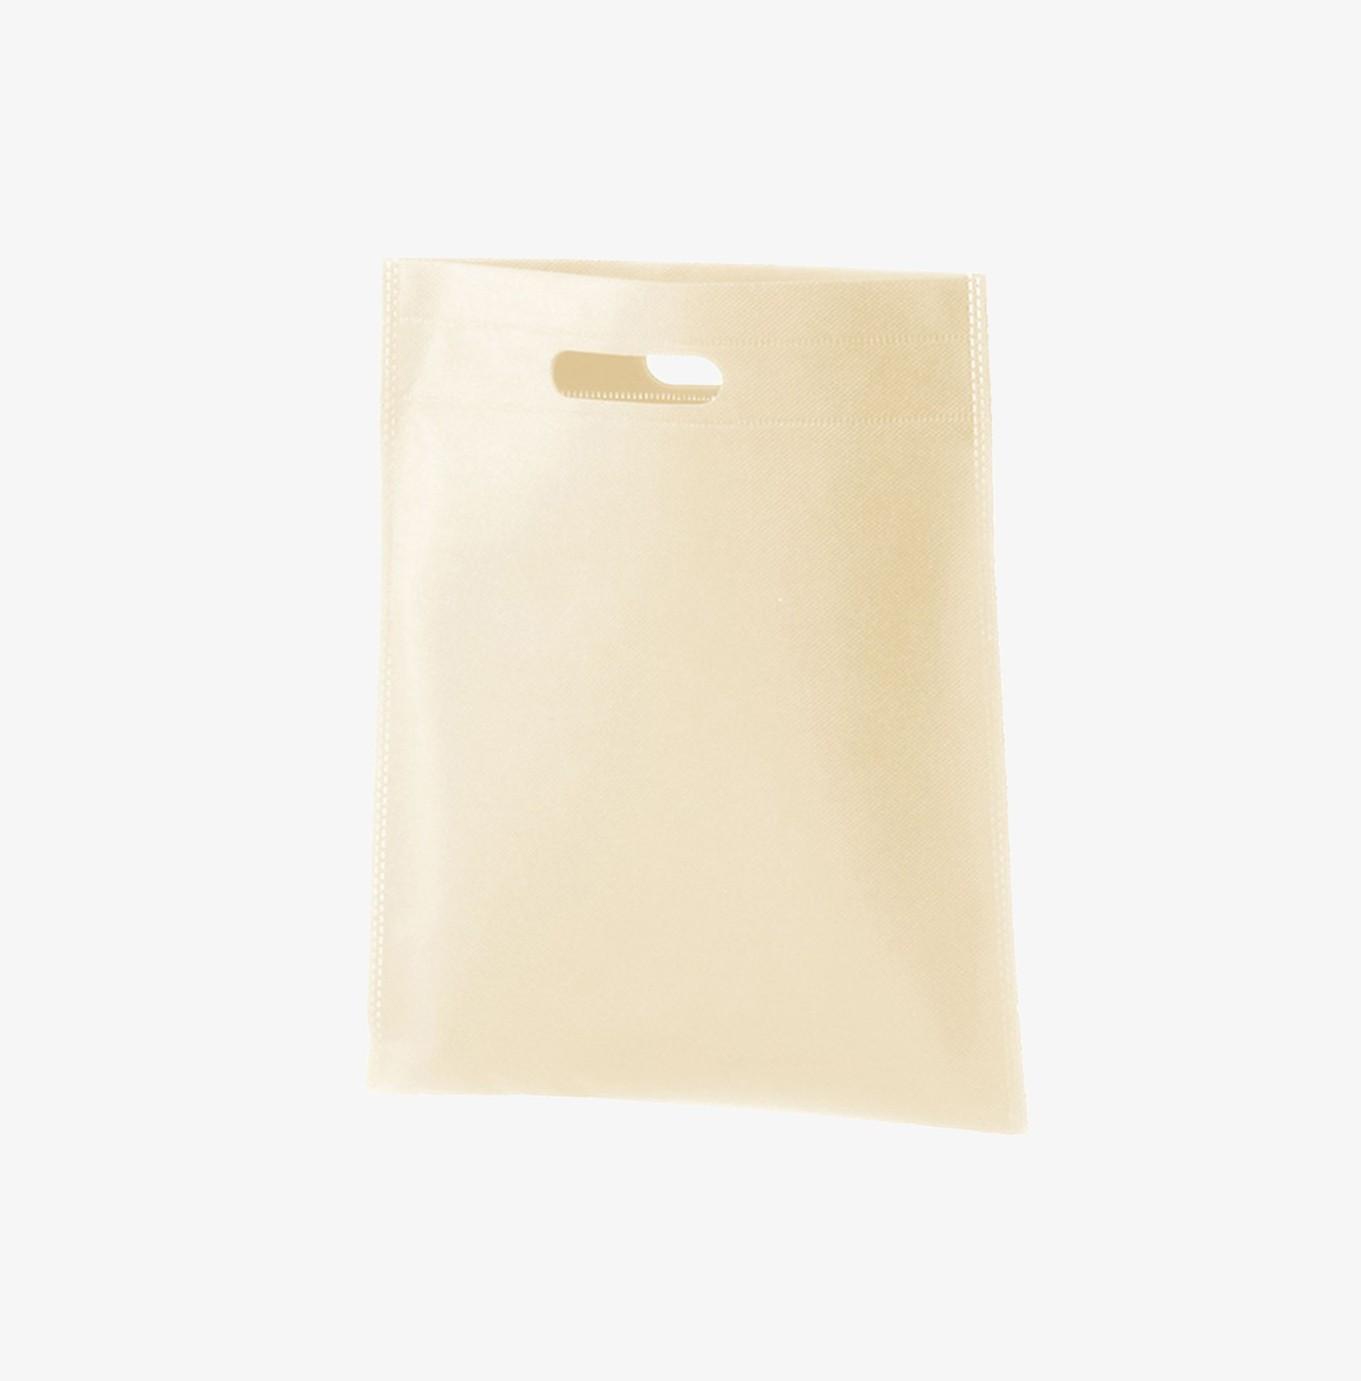 PKD35x50MB 米白色平口袋 35x50cm 150个